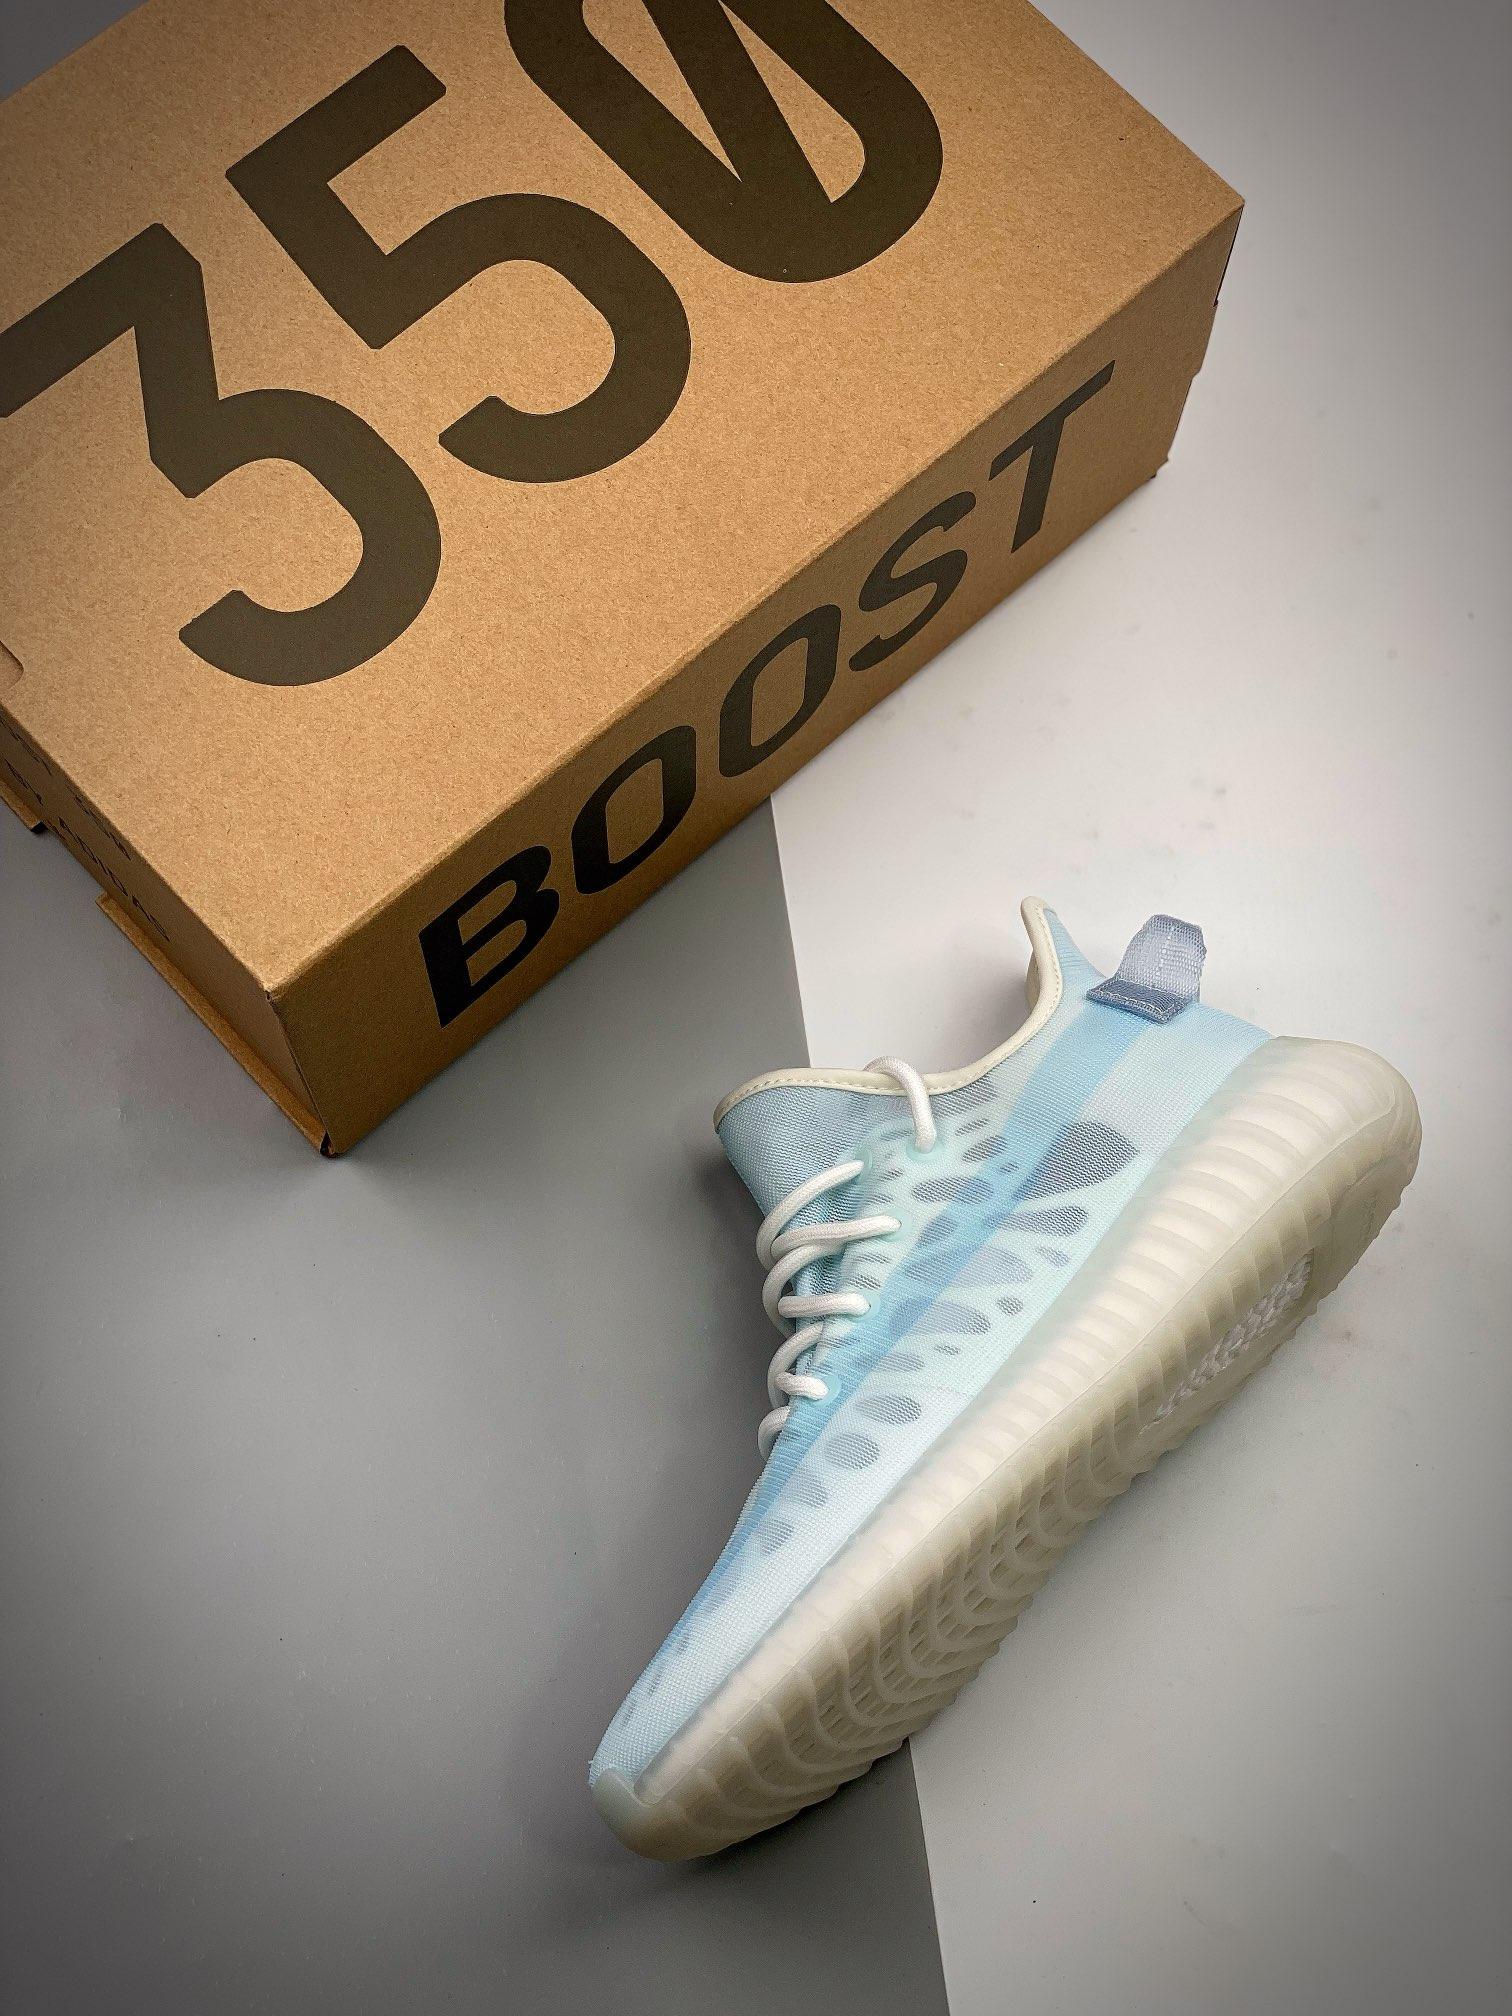 "Yeezy Boost 350V2 侃爷椰子 新配色 "" Mono Ice "" 轻质冰蓝 GW2869_什么叫河源裸鞋"